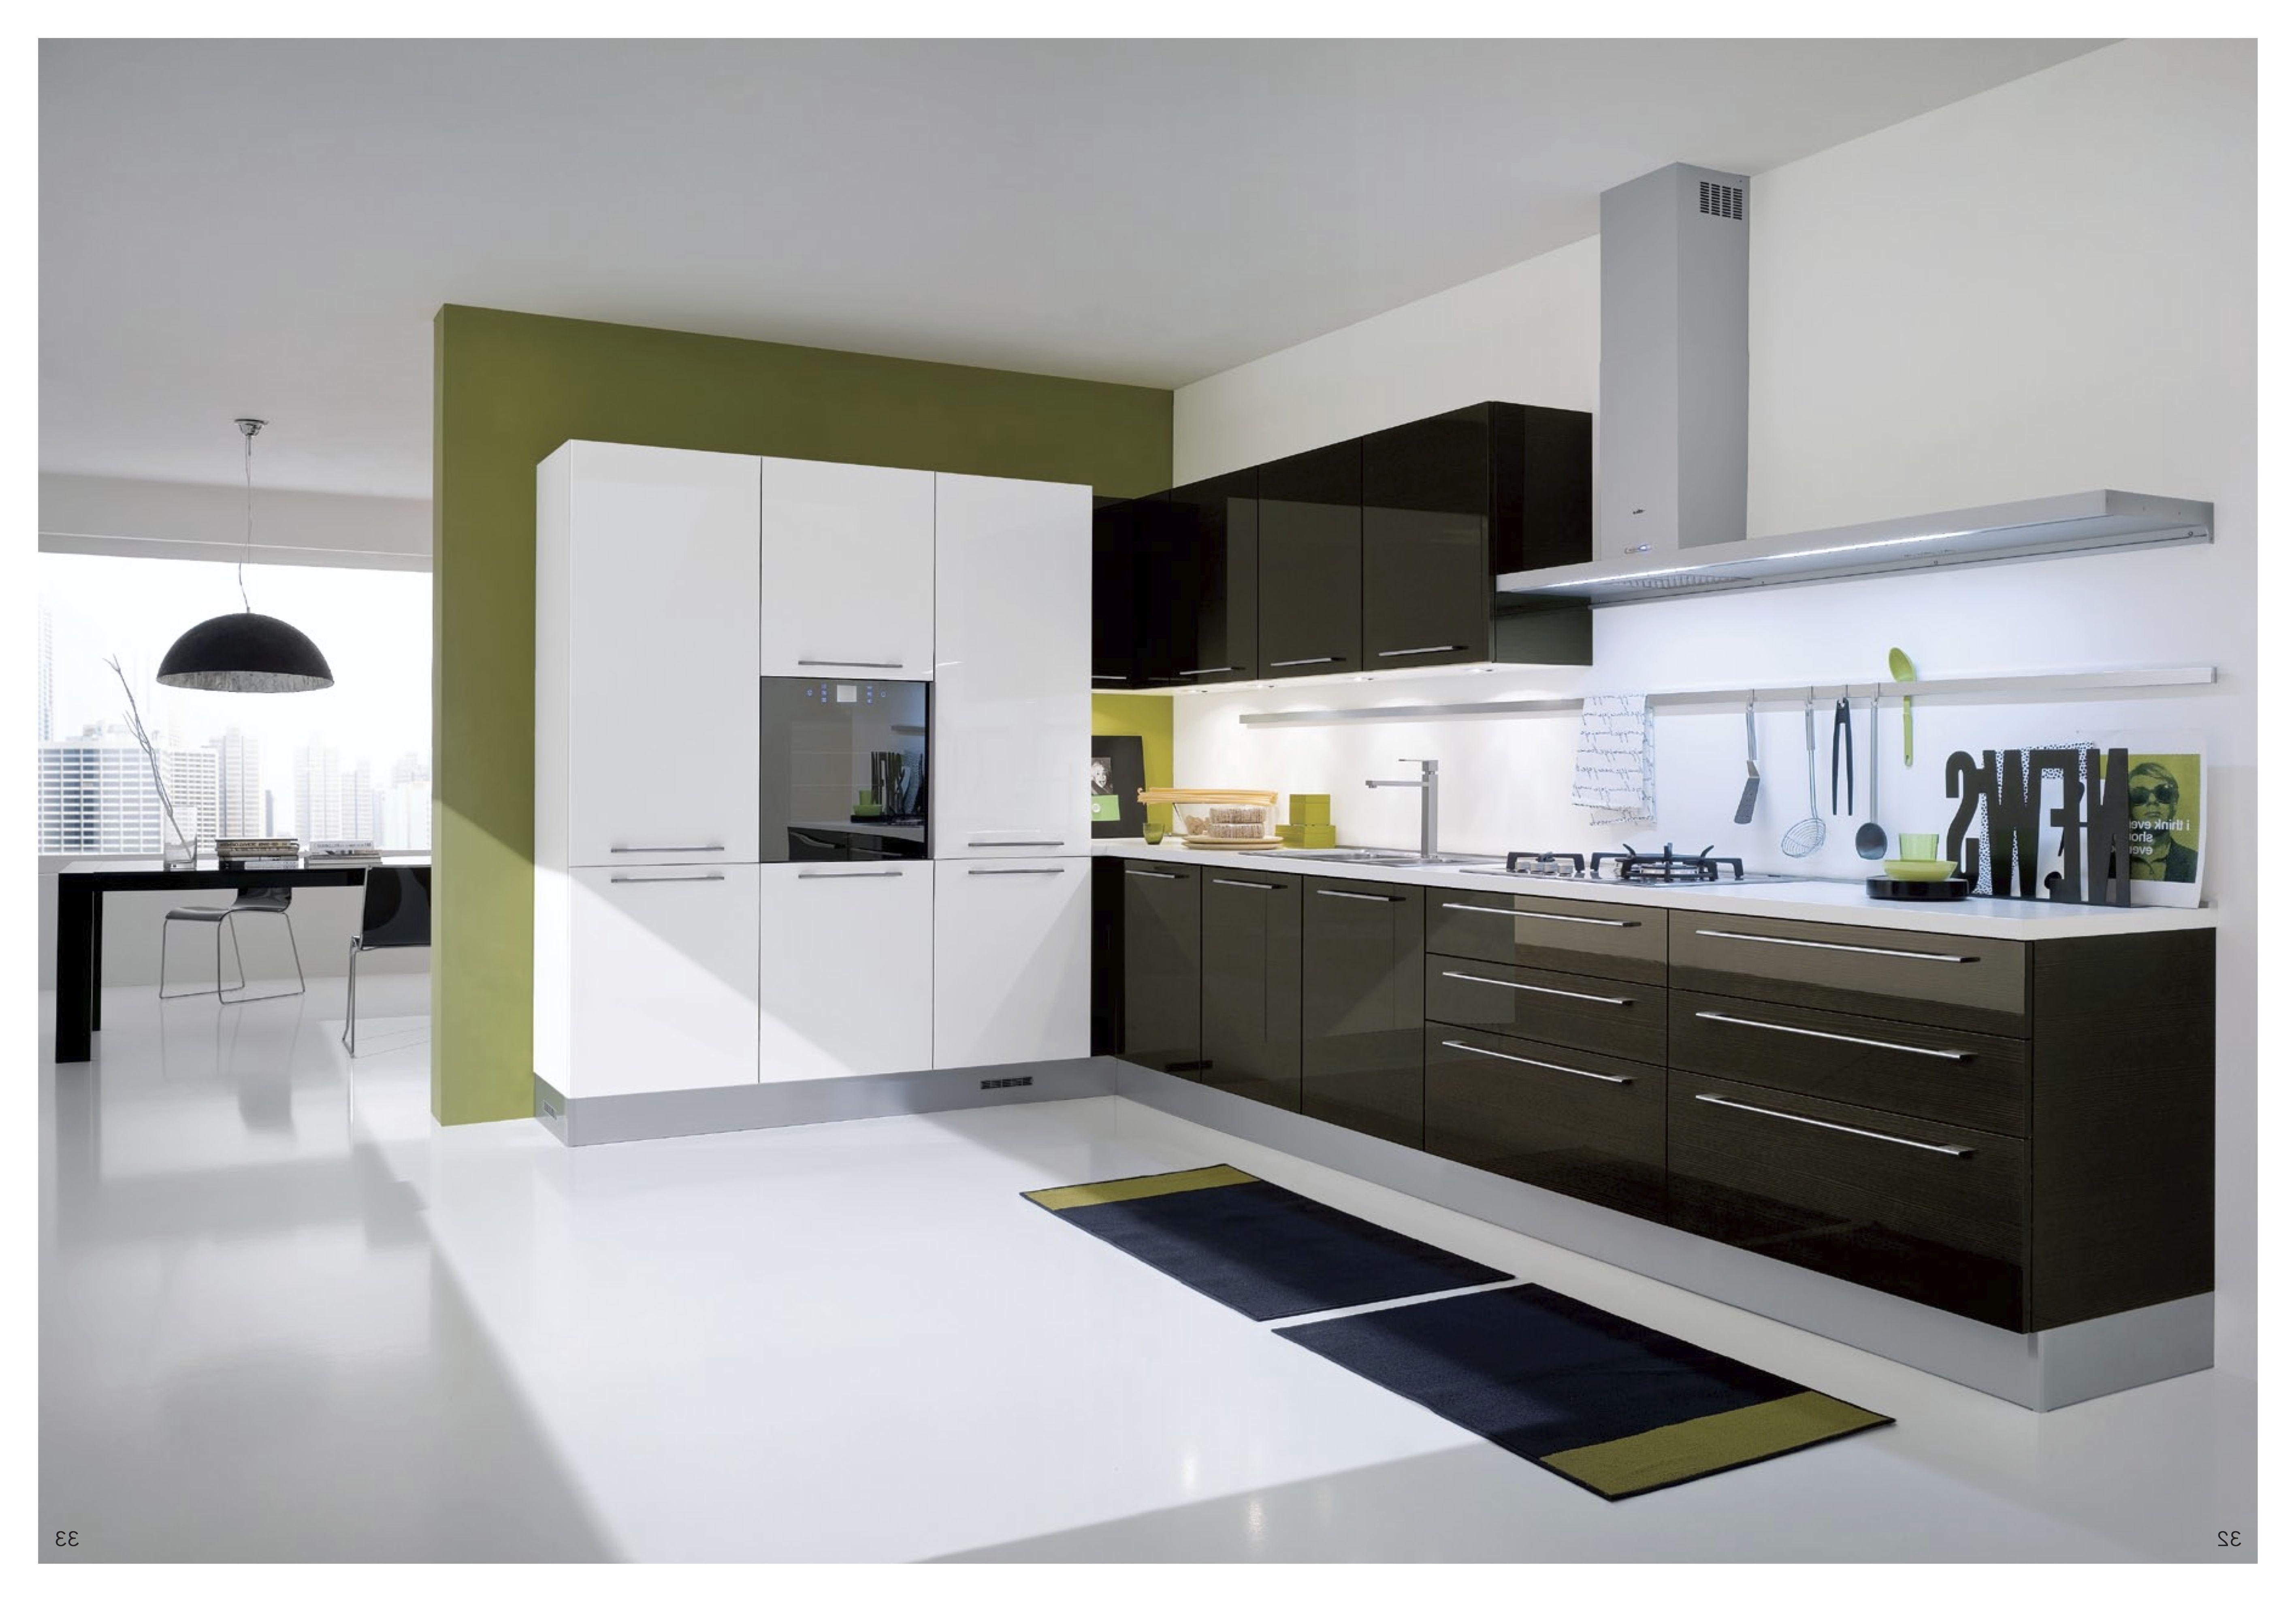 Pinhans Verheij On Landgoed Maetland  Pinterest Endearing Contemporary Style Kitchen Cabinets Decorating Inspiration